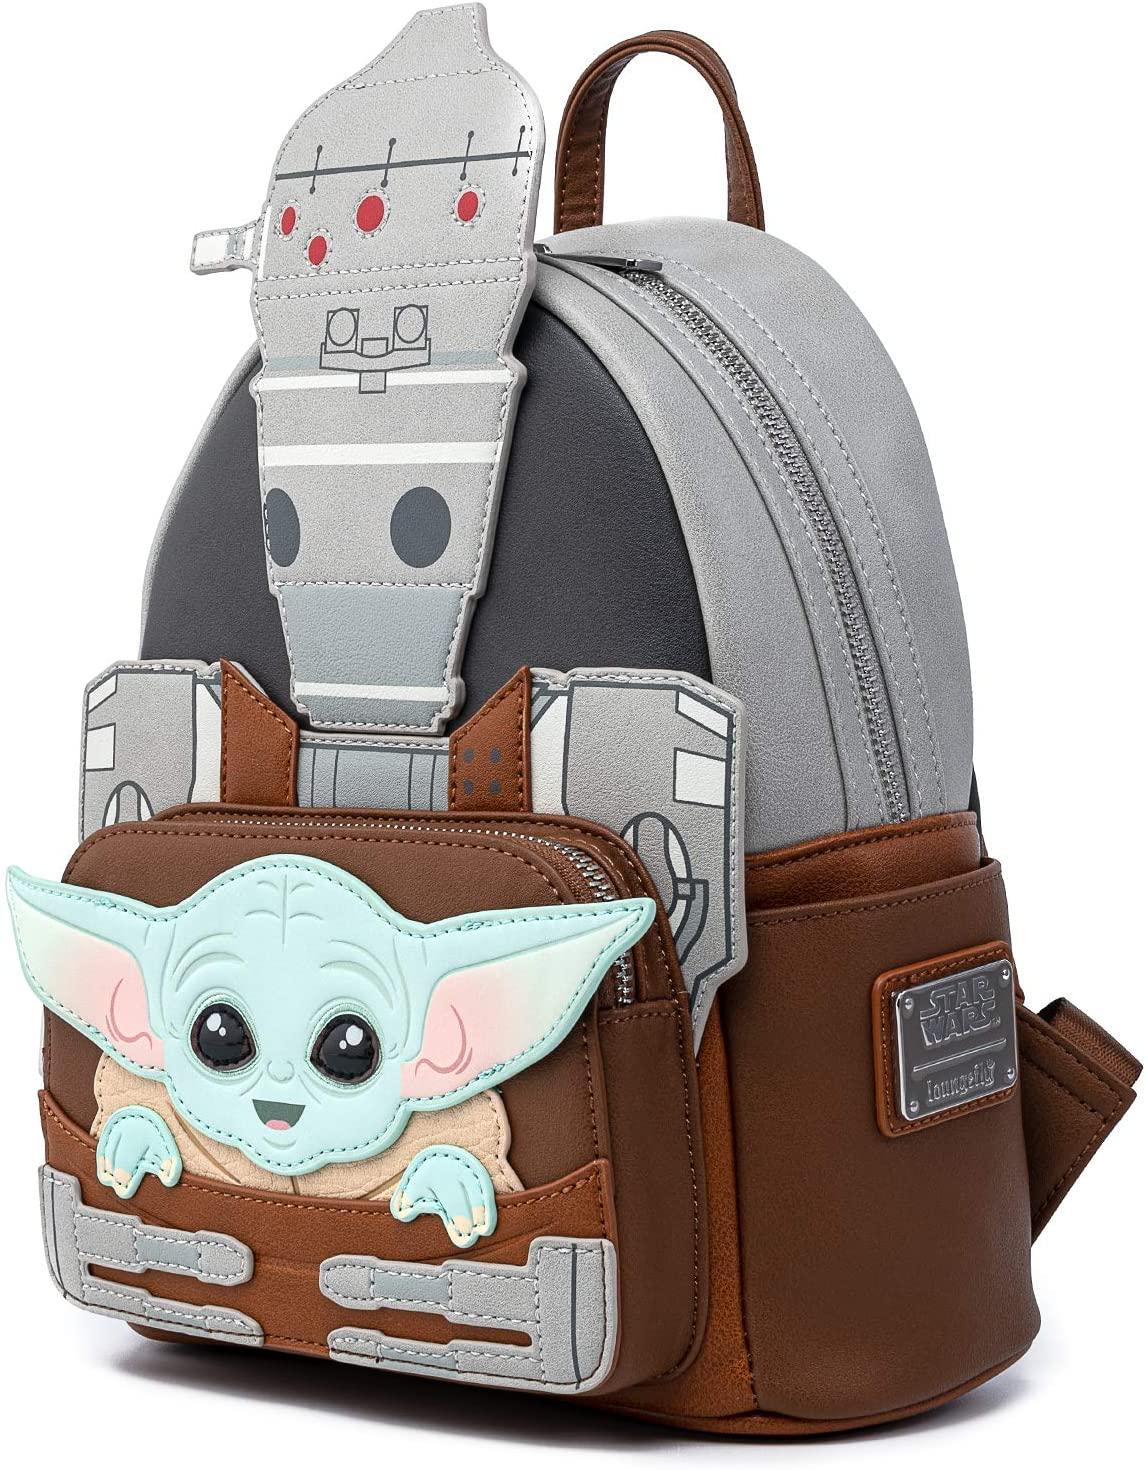 TM The Child (Grogu) and IG-11 Mini Cosplay Backpack 2